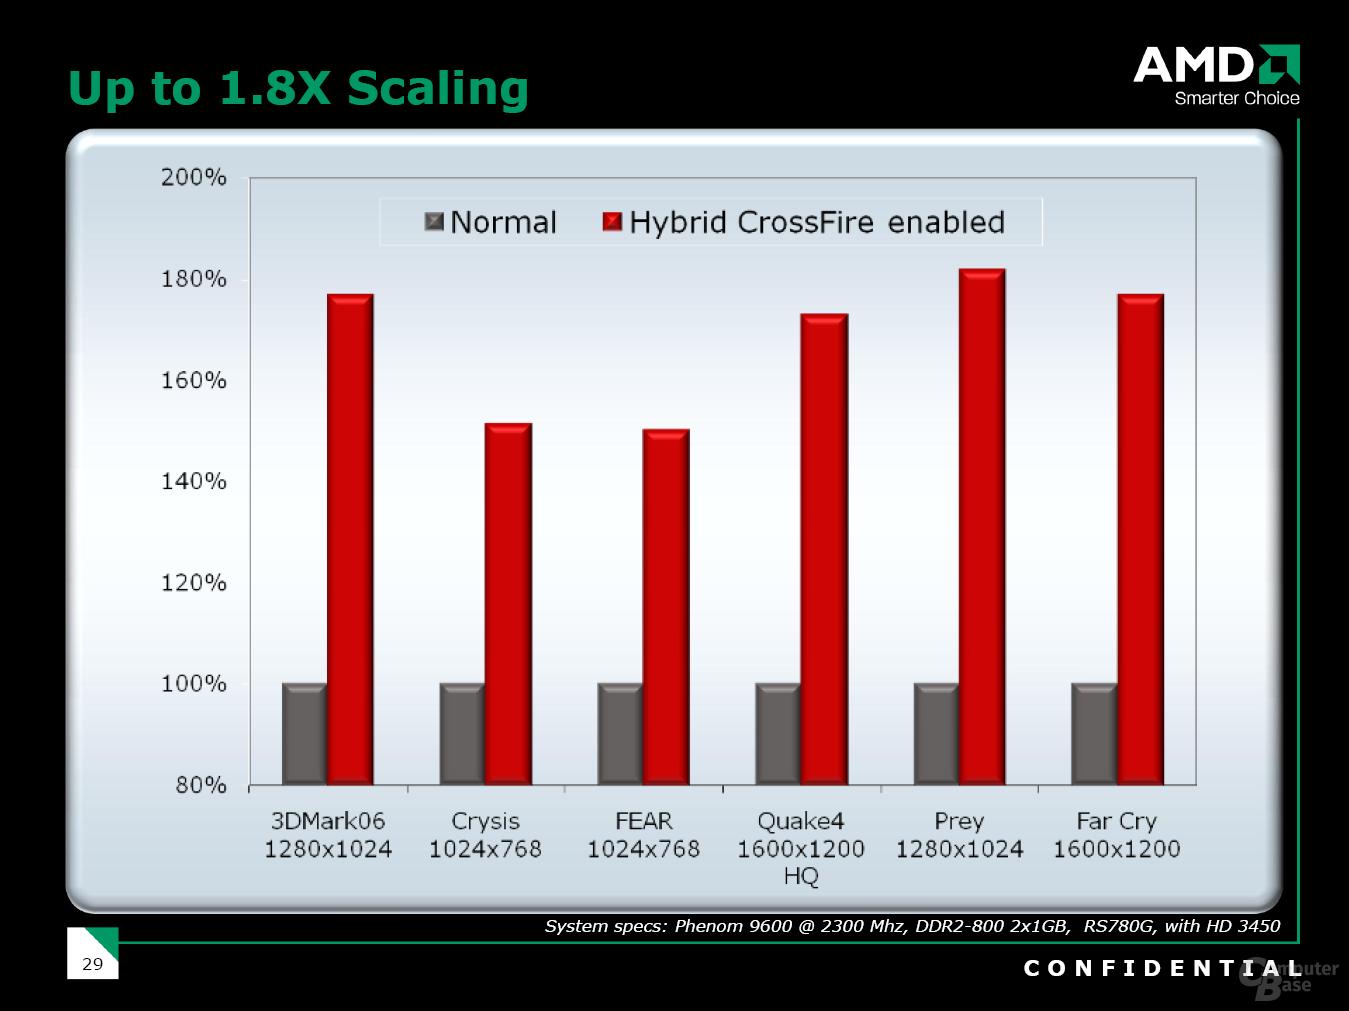 Hybrid CrossFire Performance